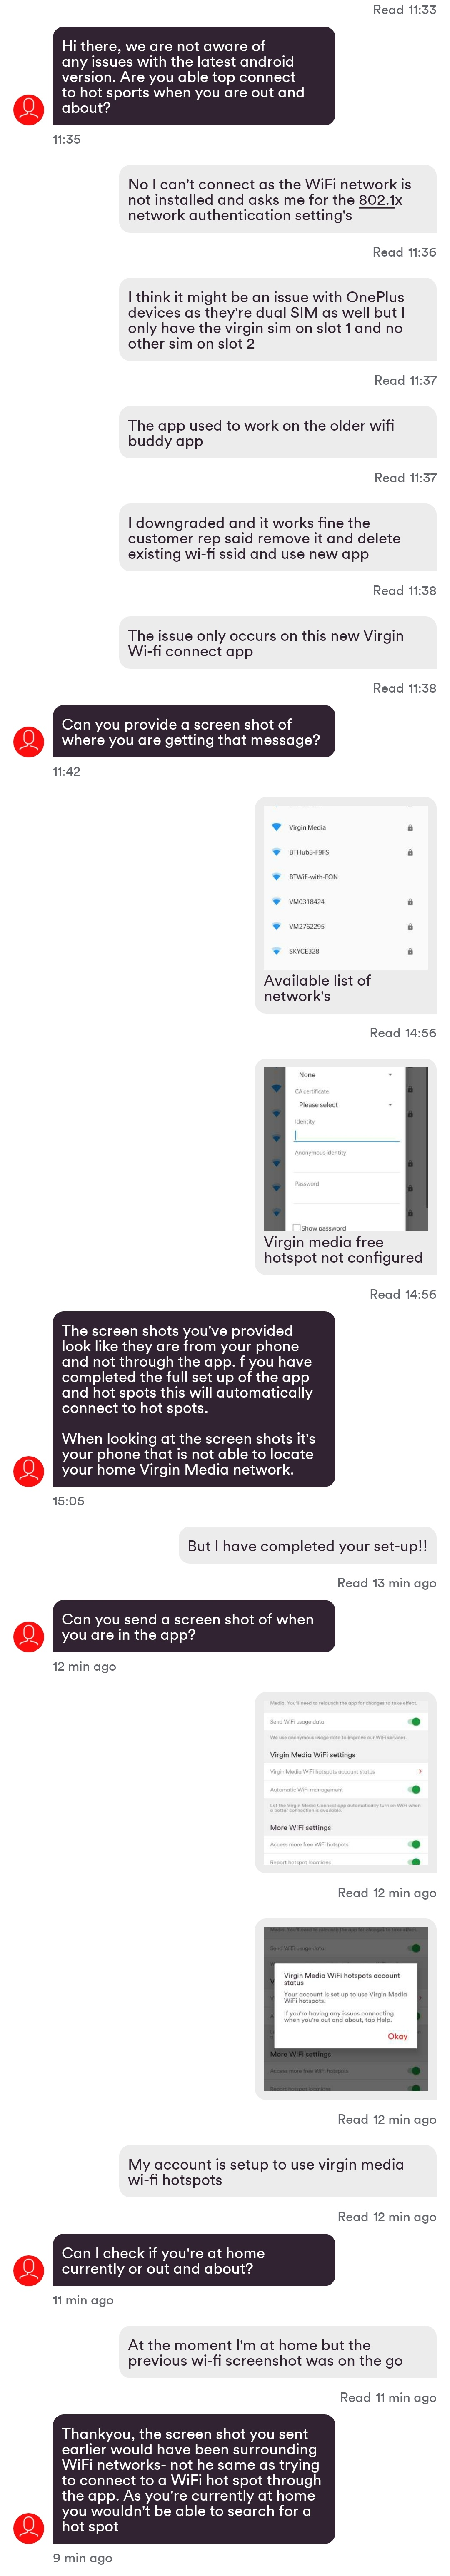 Virgin Mobile Wi-fi app - Virgin Media Community - 3840748